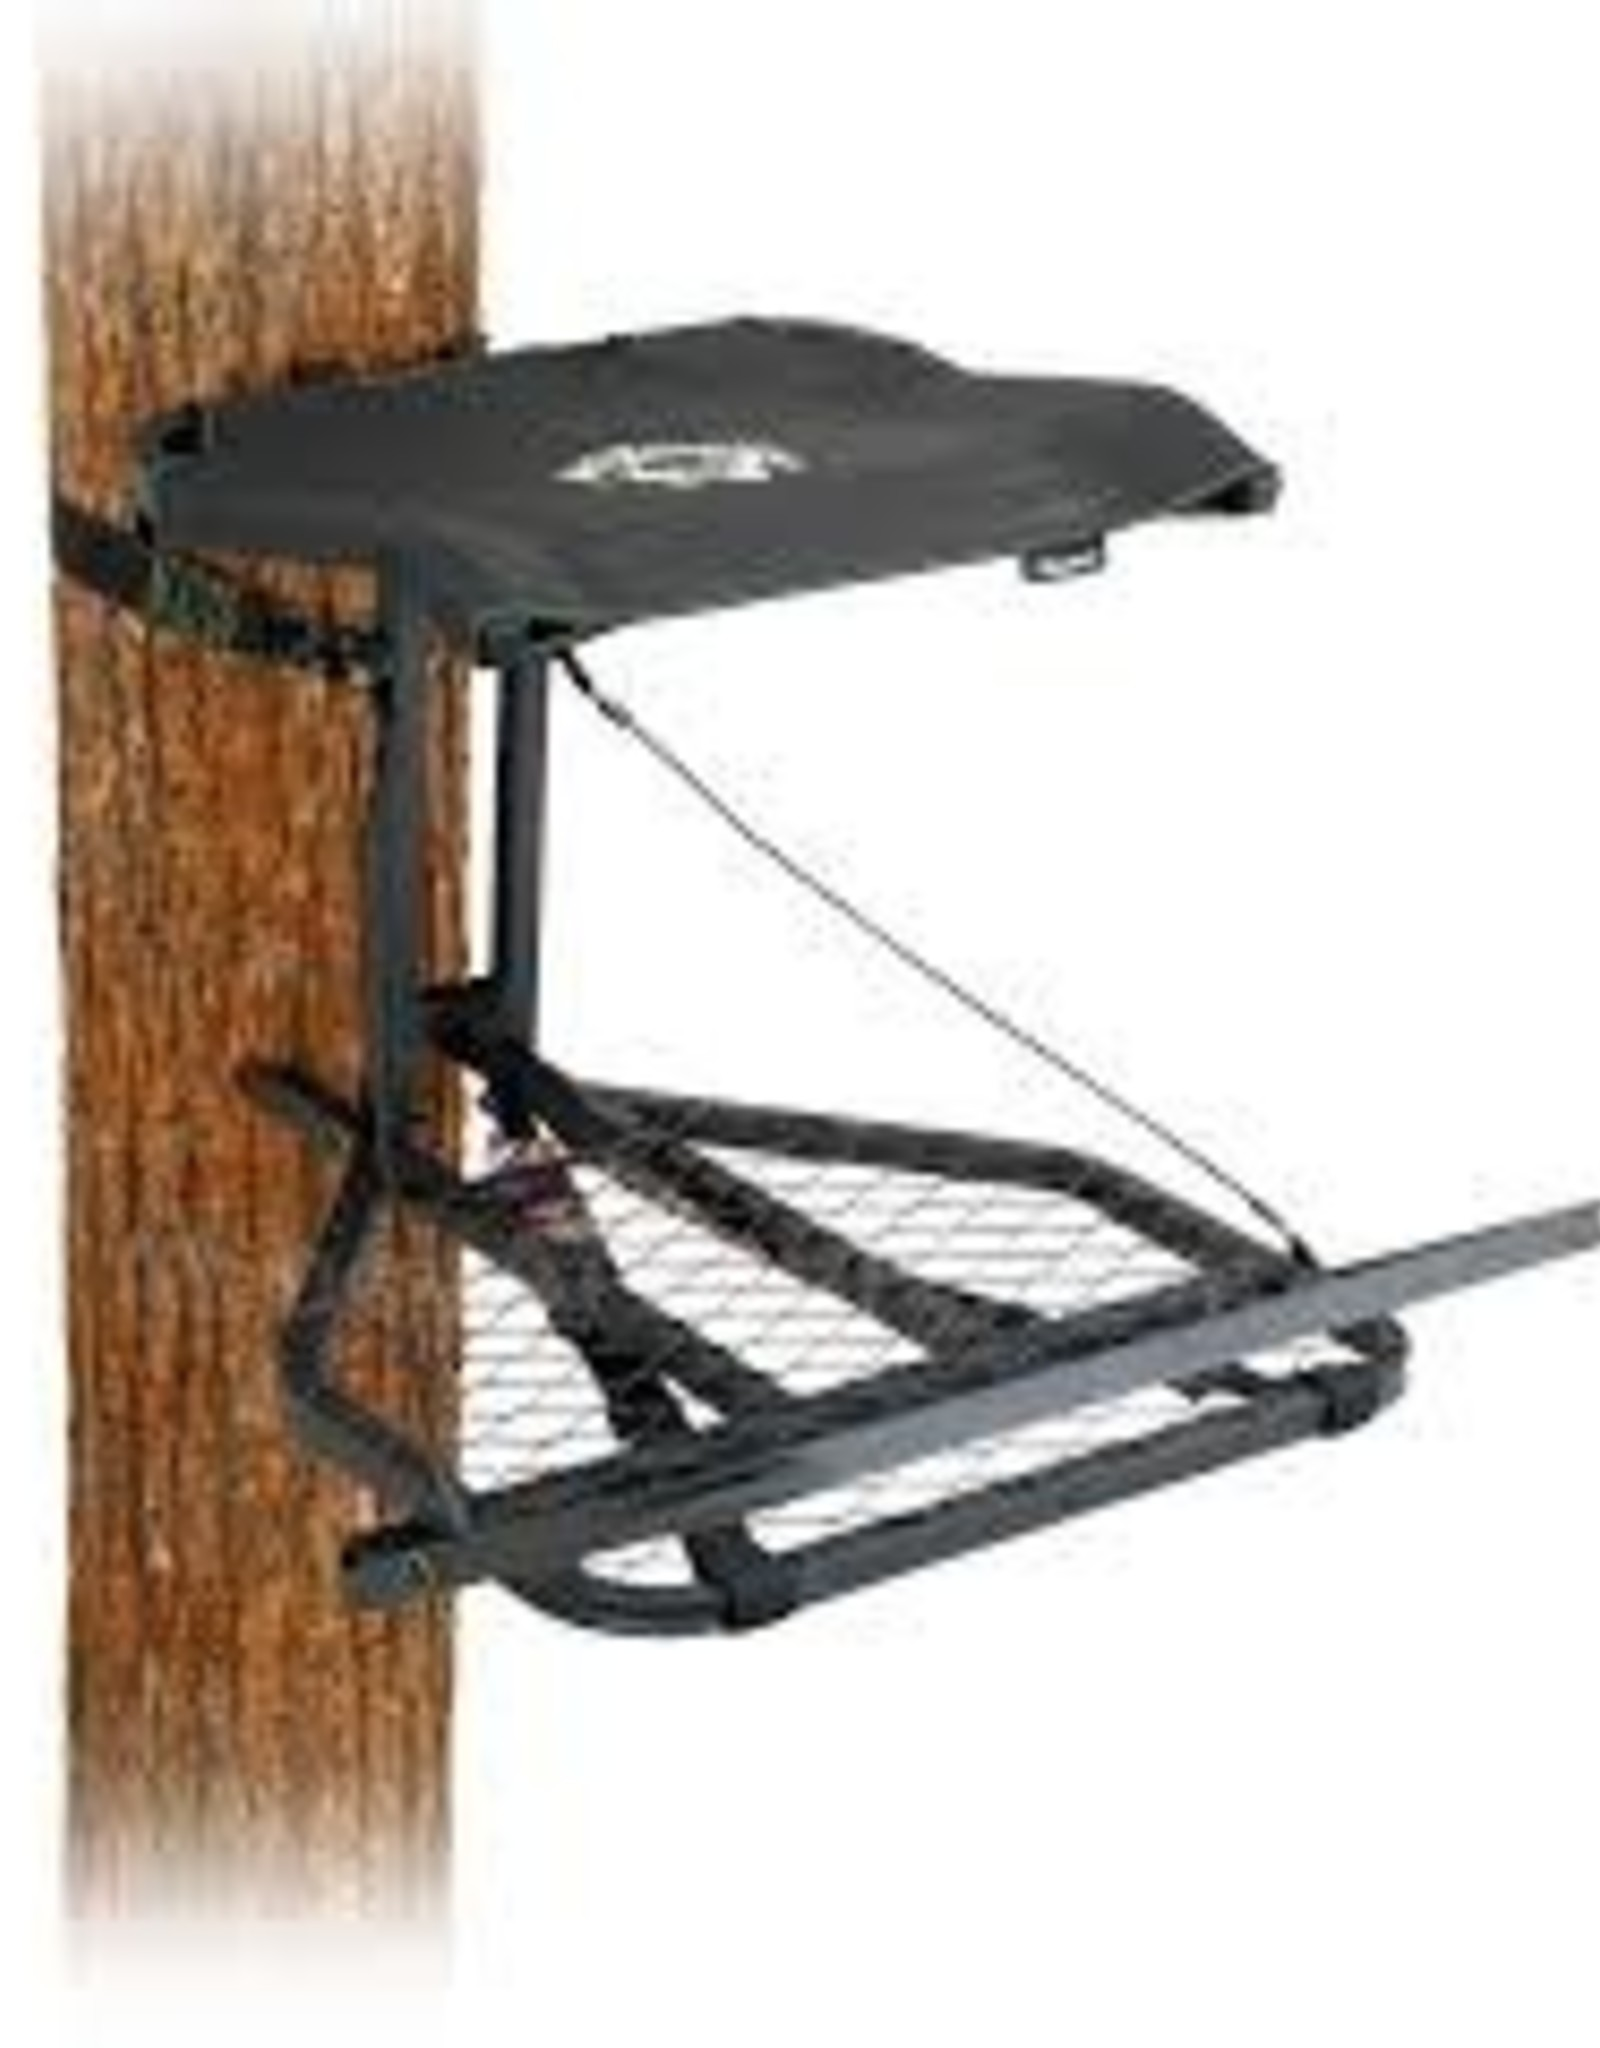 Ameristep Hang on Tree Stand